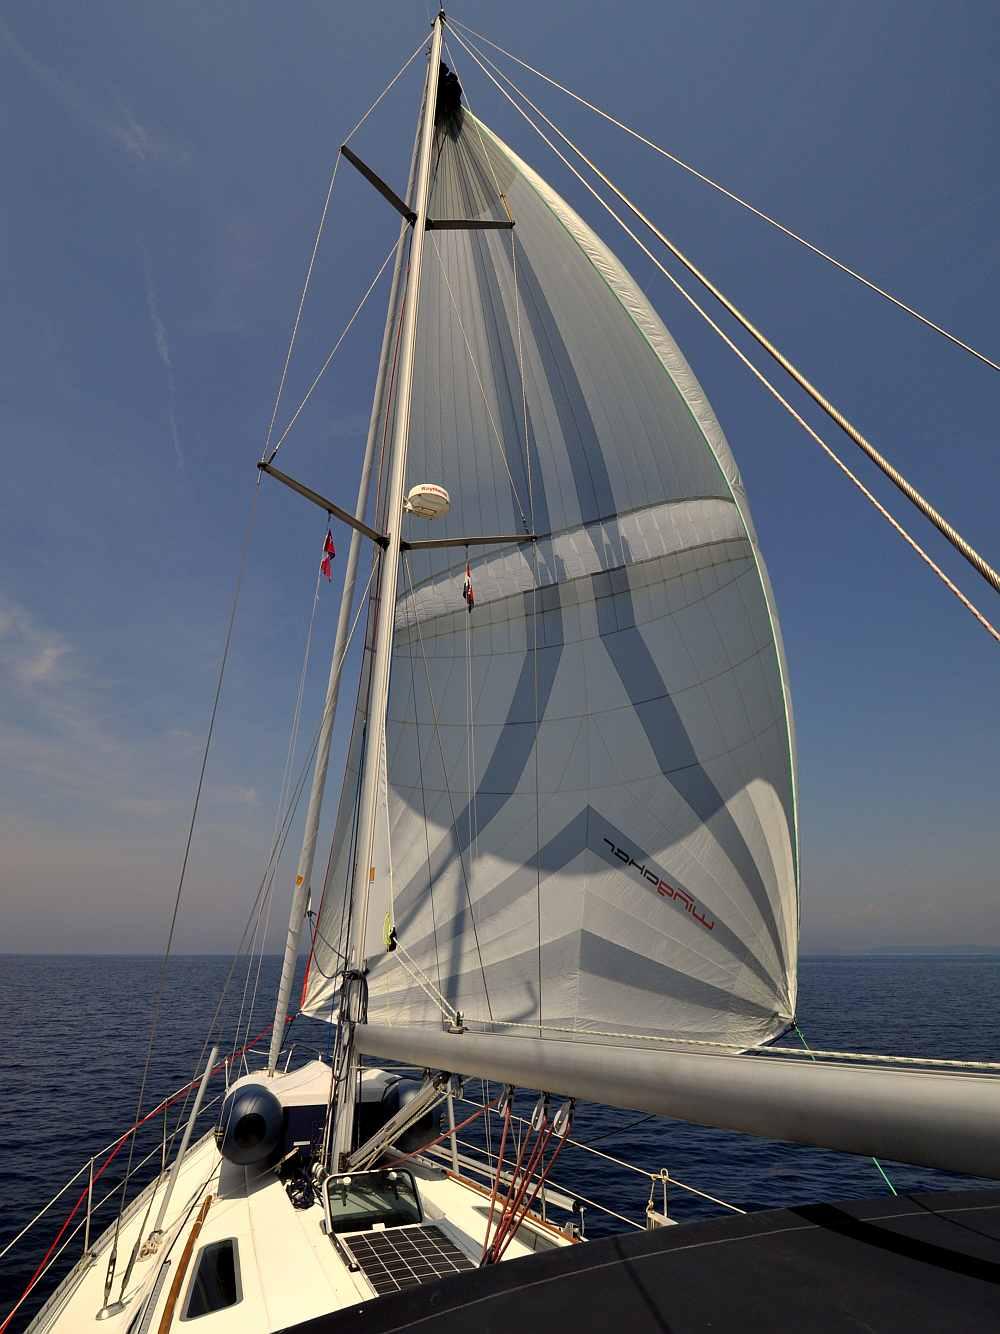 unter-parasail-wingaker-segeln